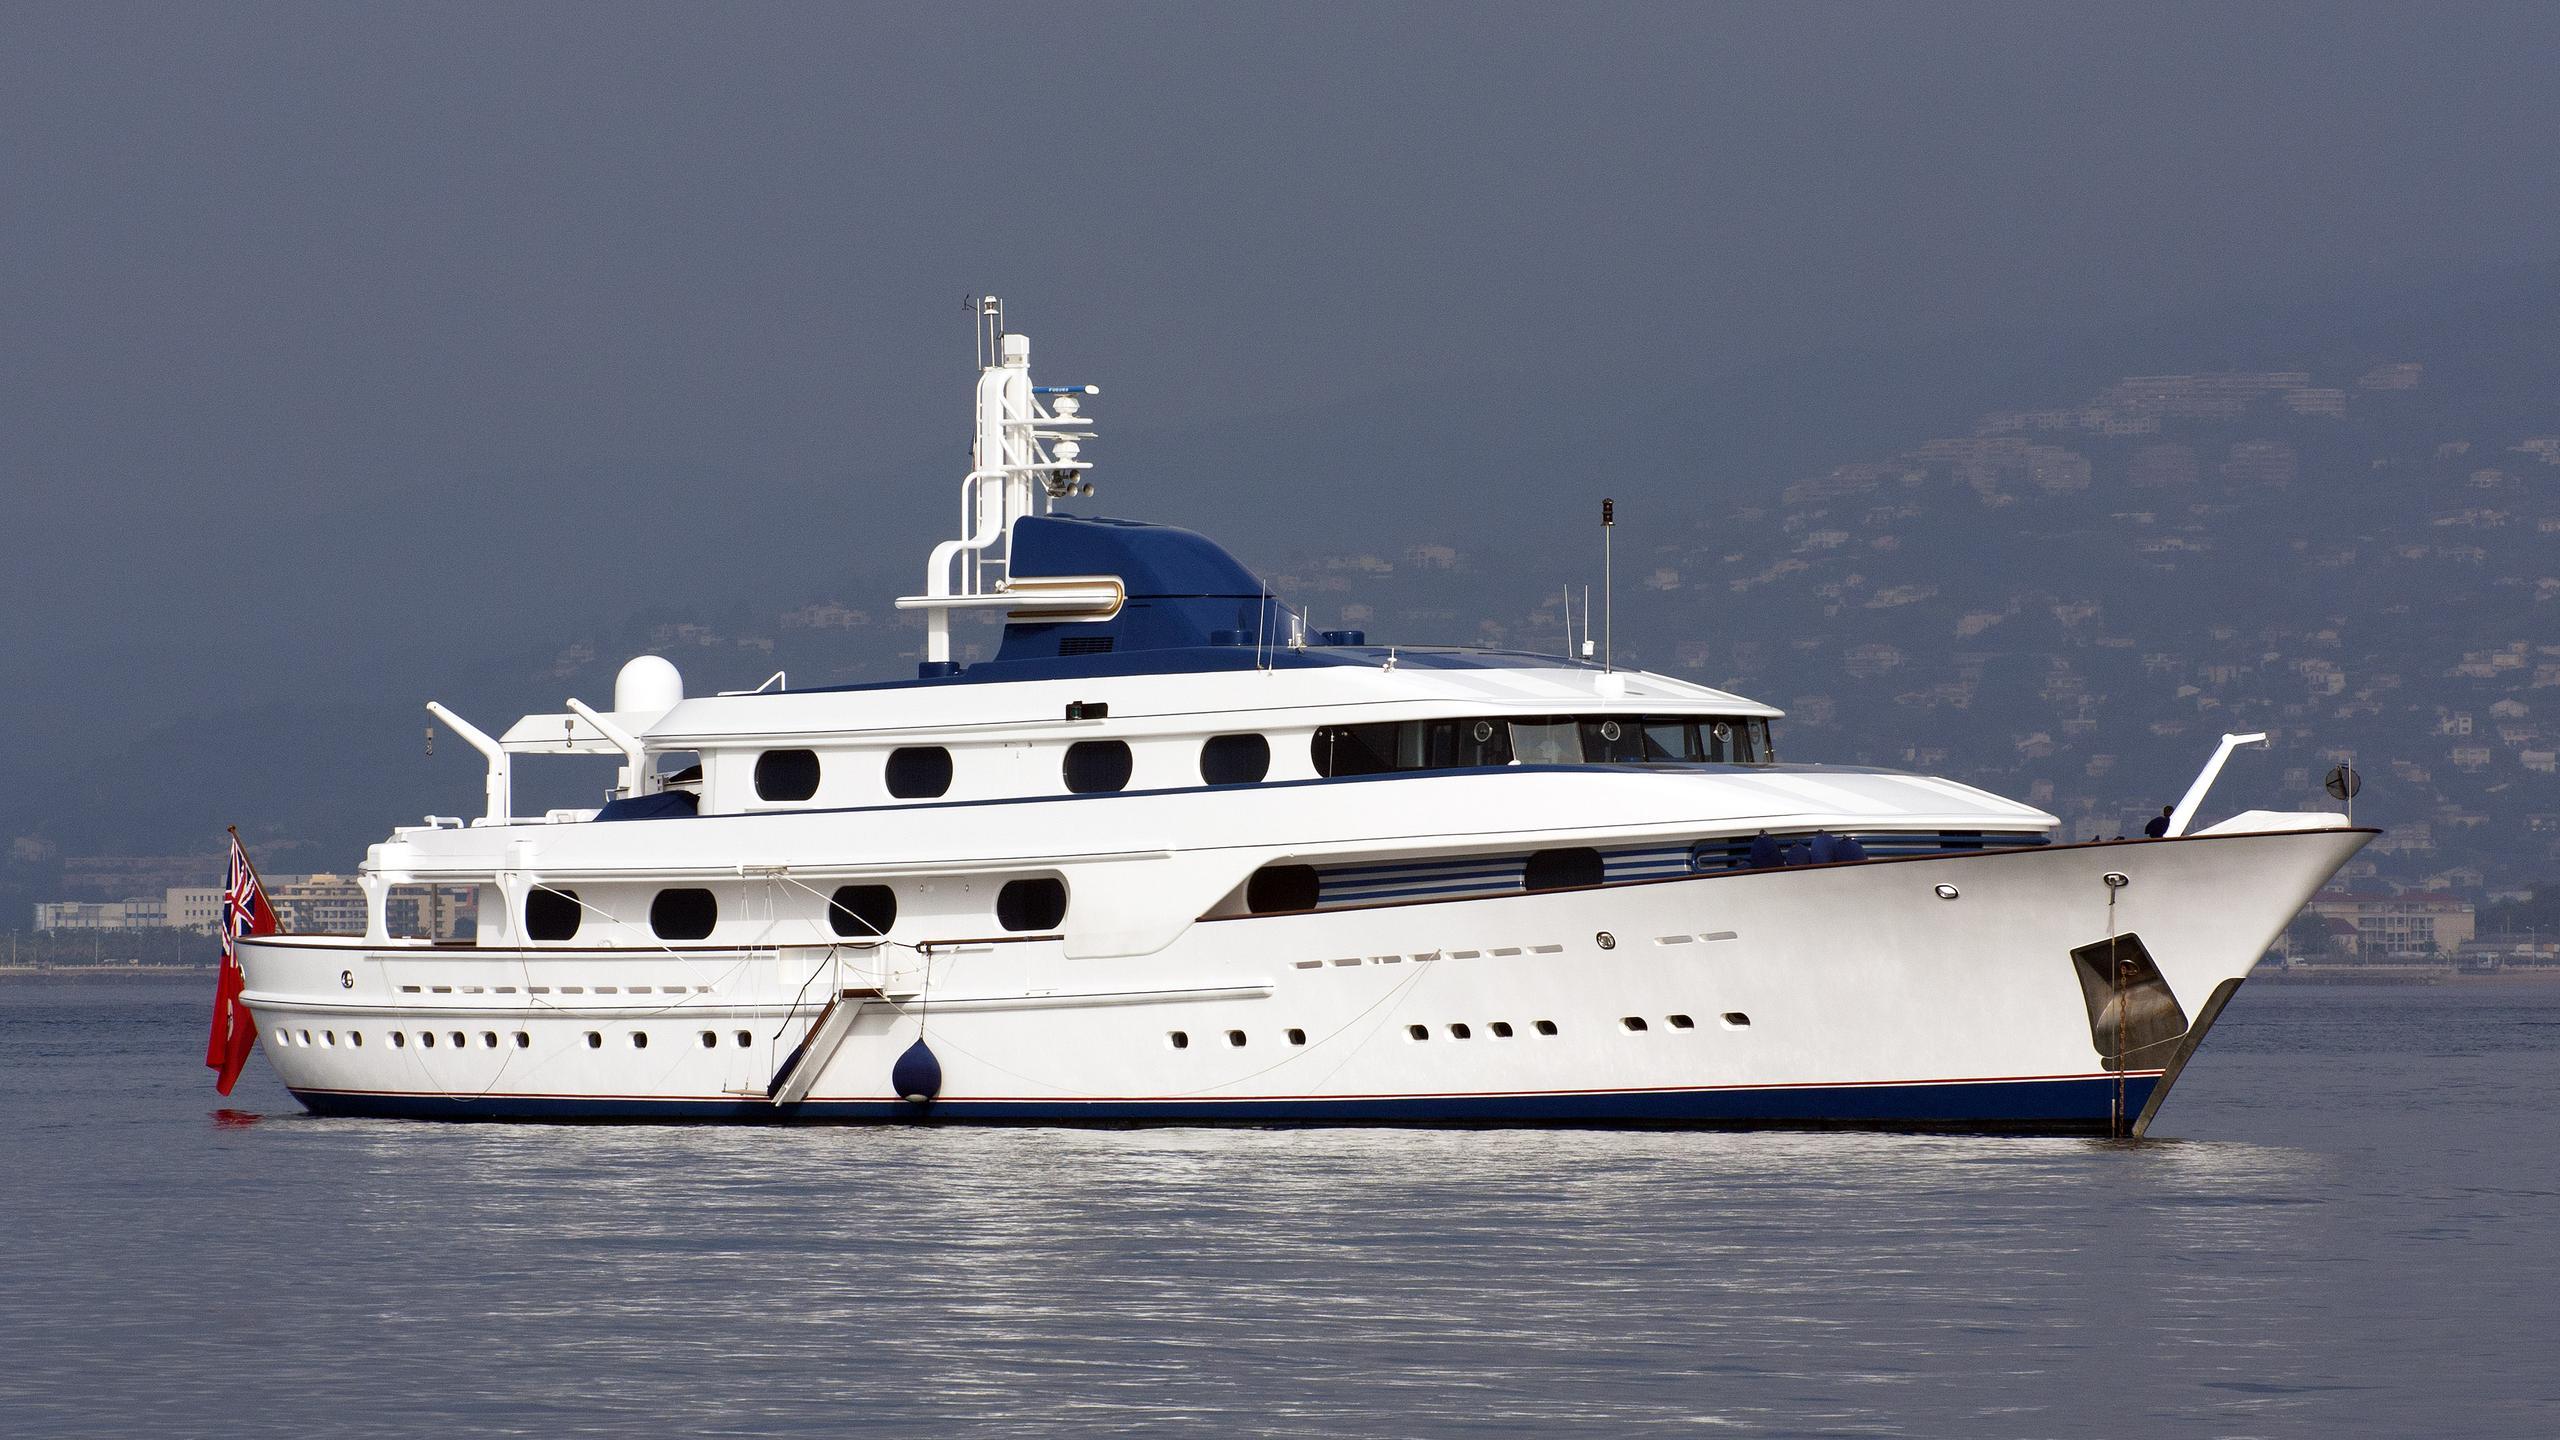 cleopatra-c-motor-yacht-amels-1985-57m-half-profile